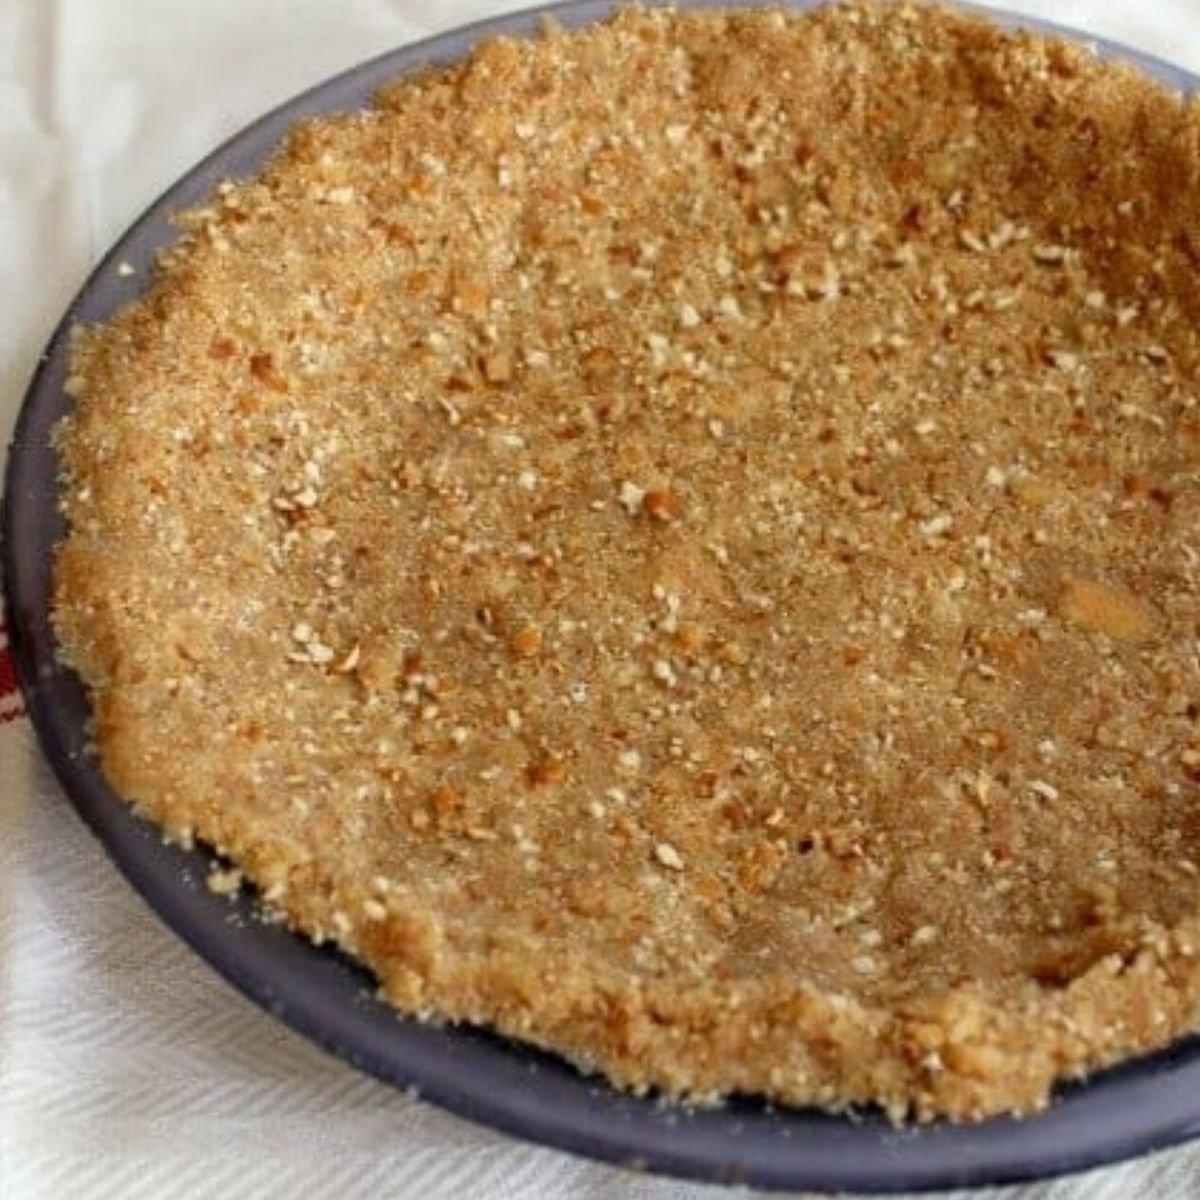 finished crumb crust in a pie plate.